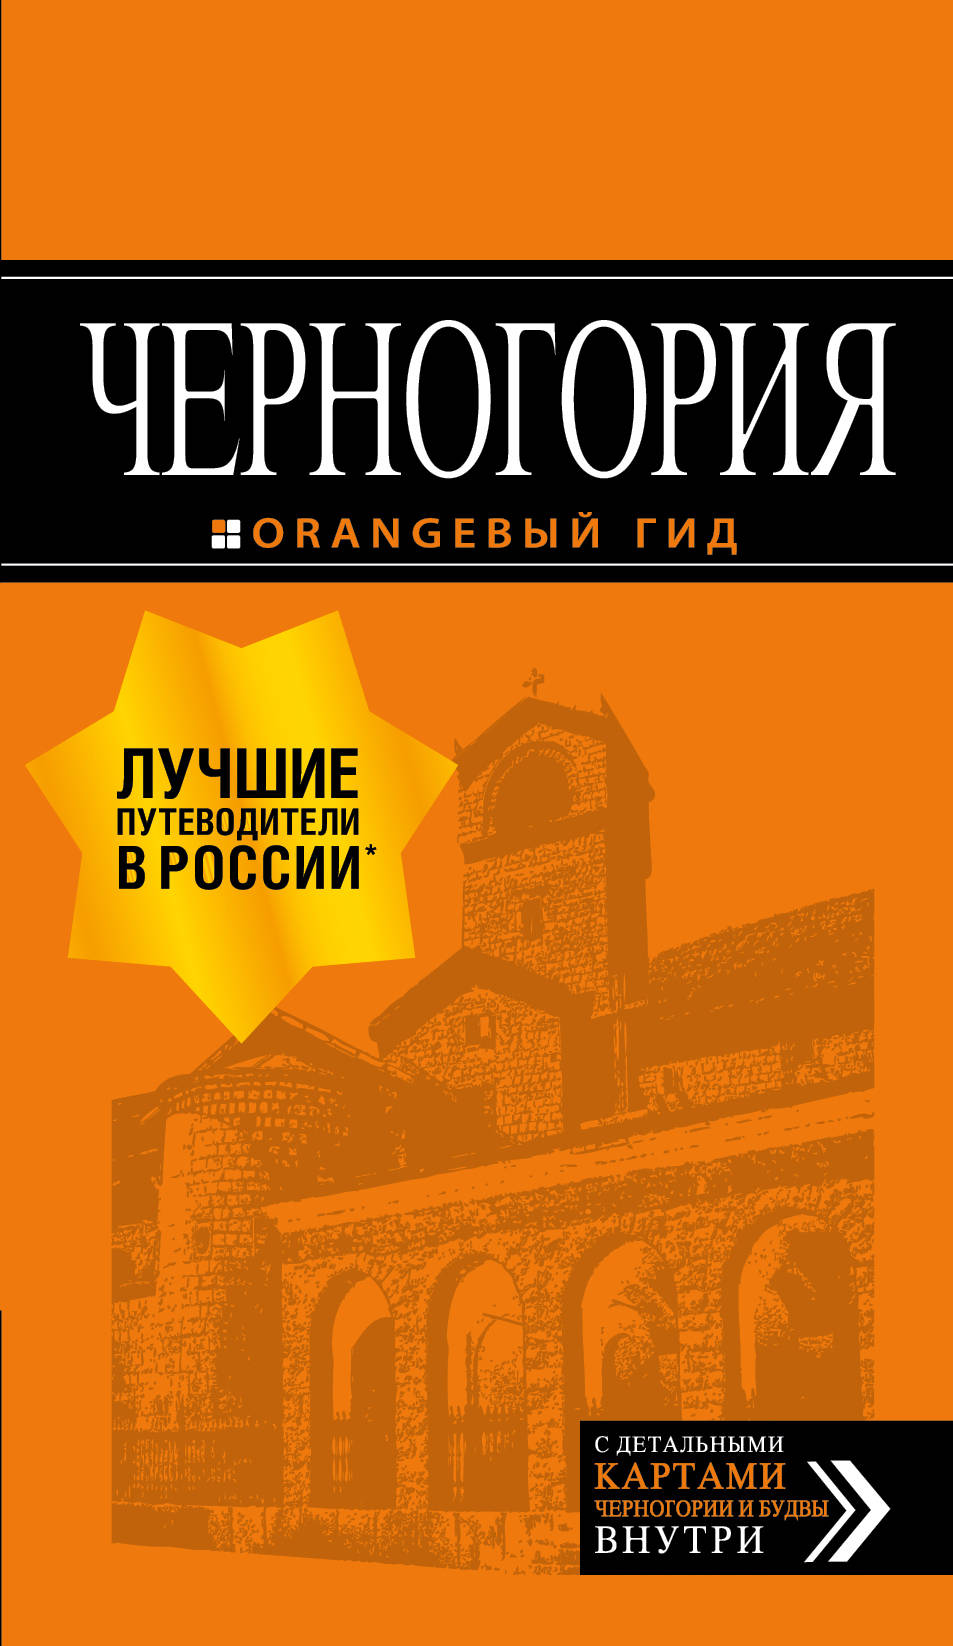 izmeritelplus.ru Черногория: путеводитель. 6-е изд., испр. и доп.